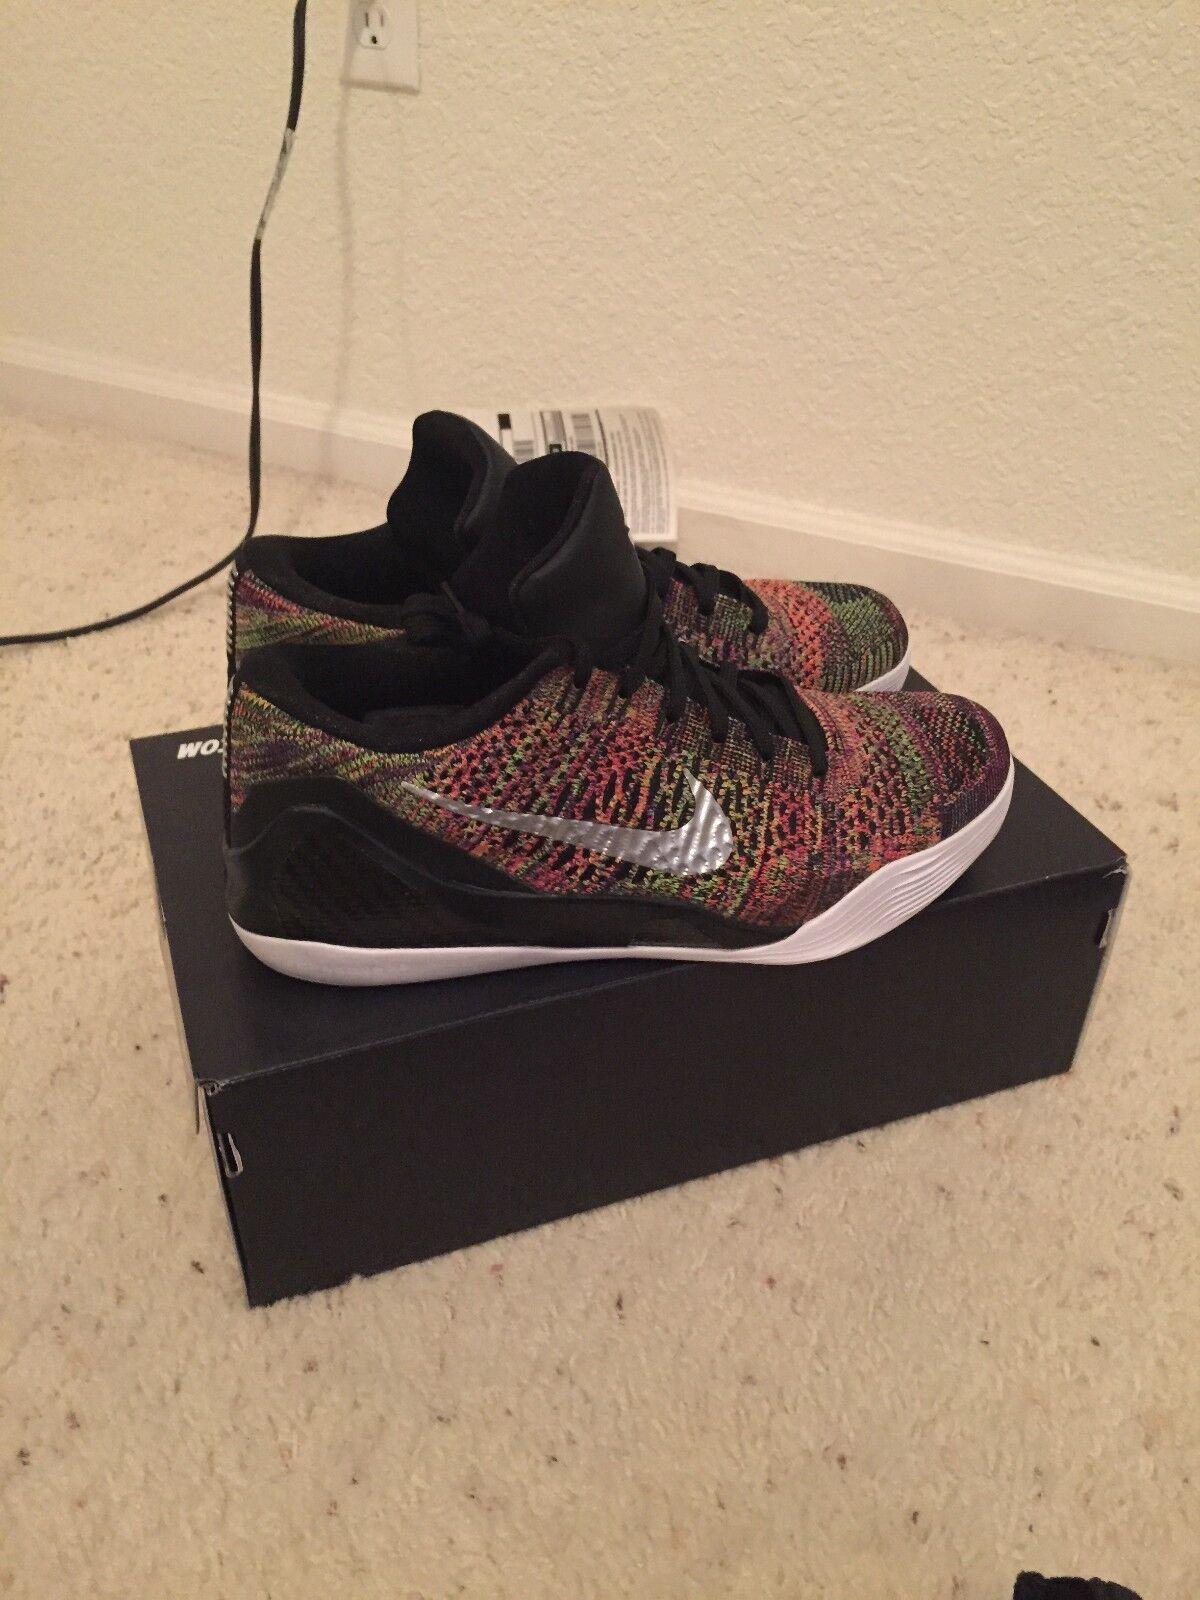 quality design fc8bf e167f Nike ID Kobe 9 IX baja baja baja multicolor comodo baratos zapatos de mujer  zapatos de